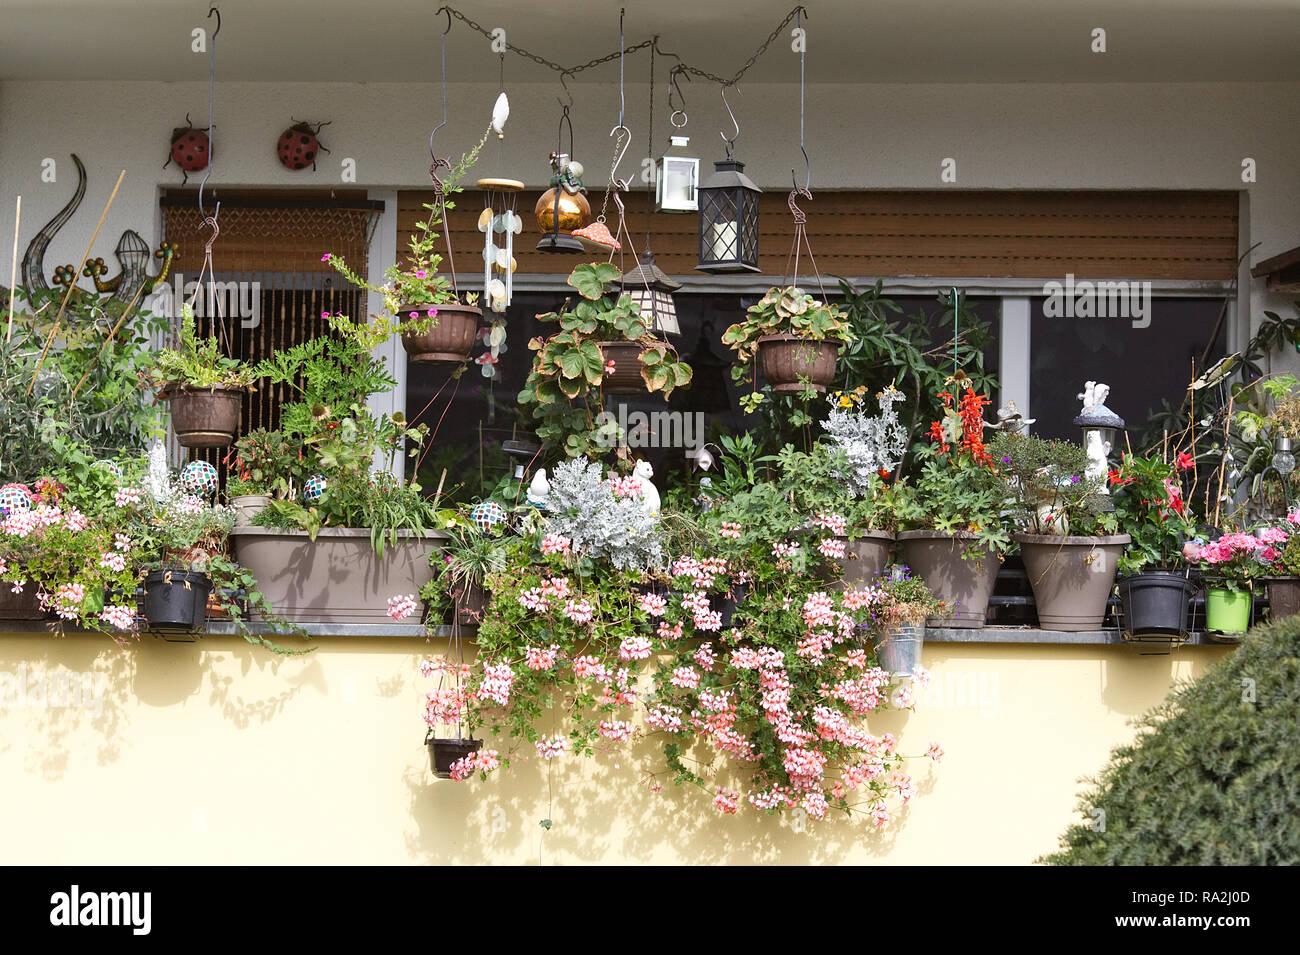 Decorative balcony garden. - Stock Image